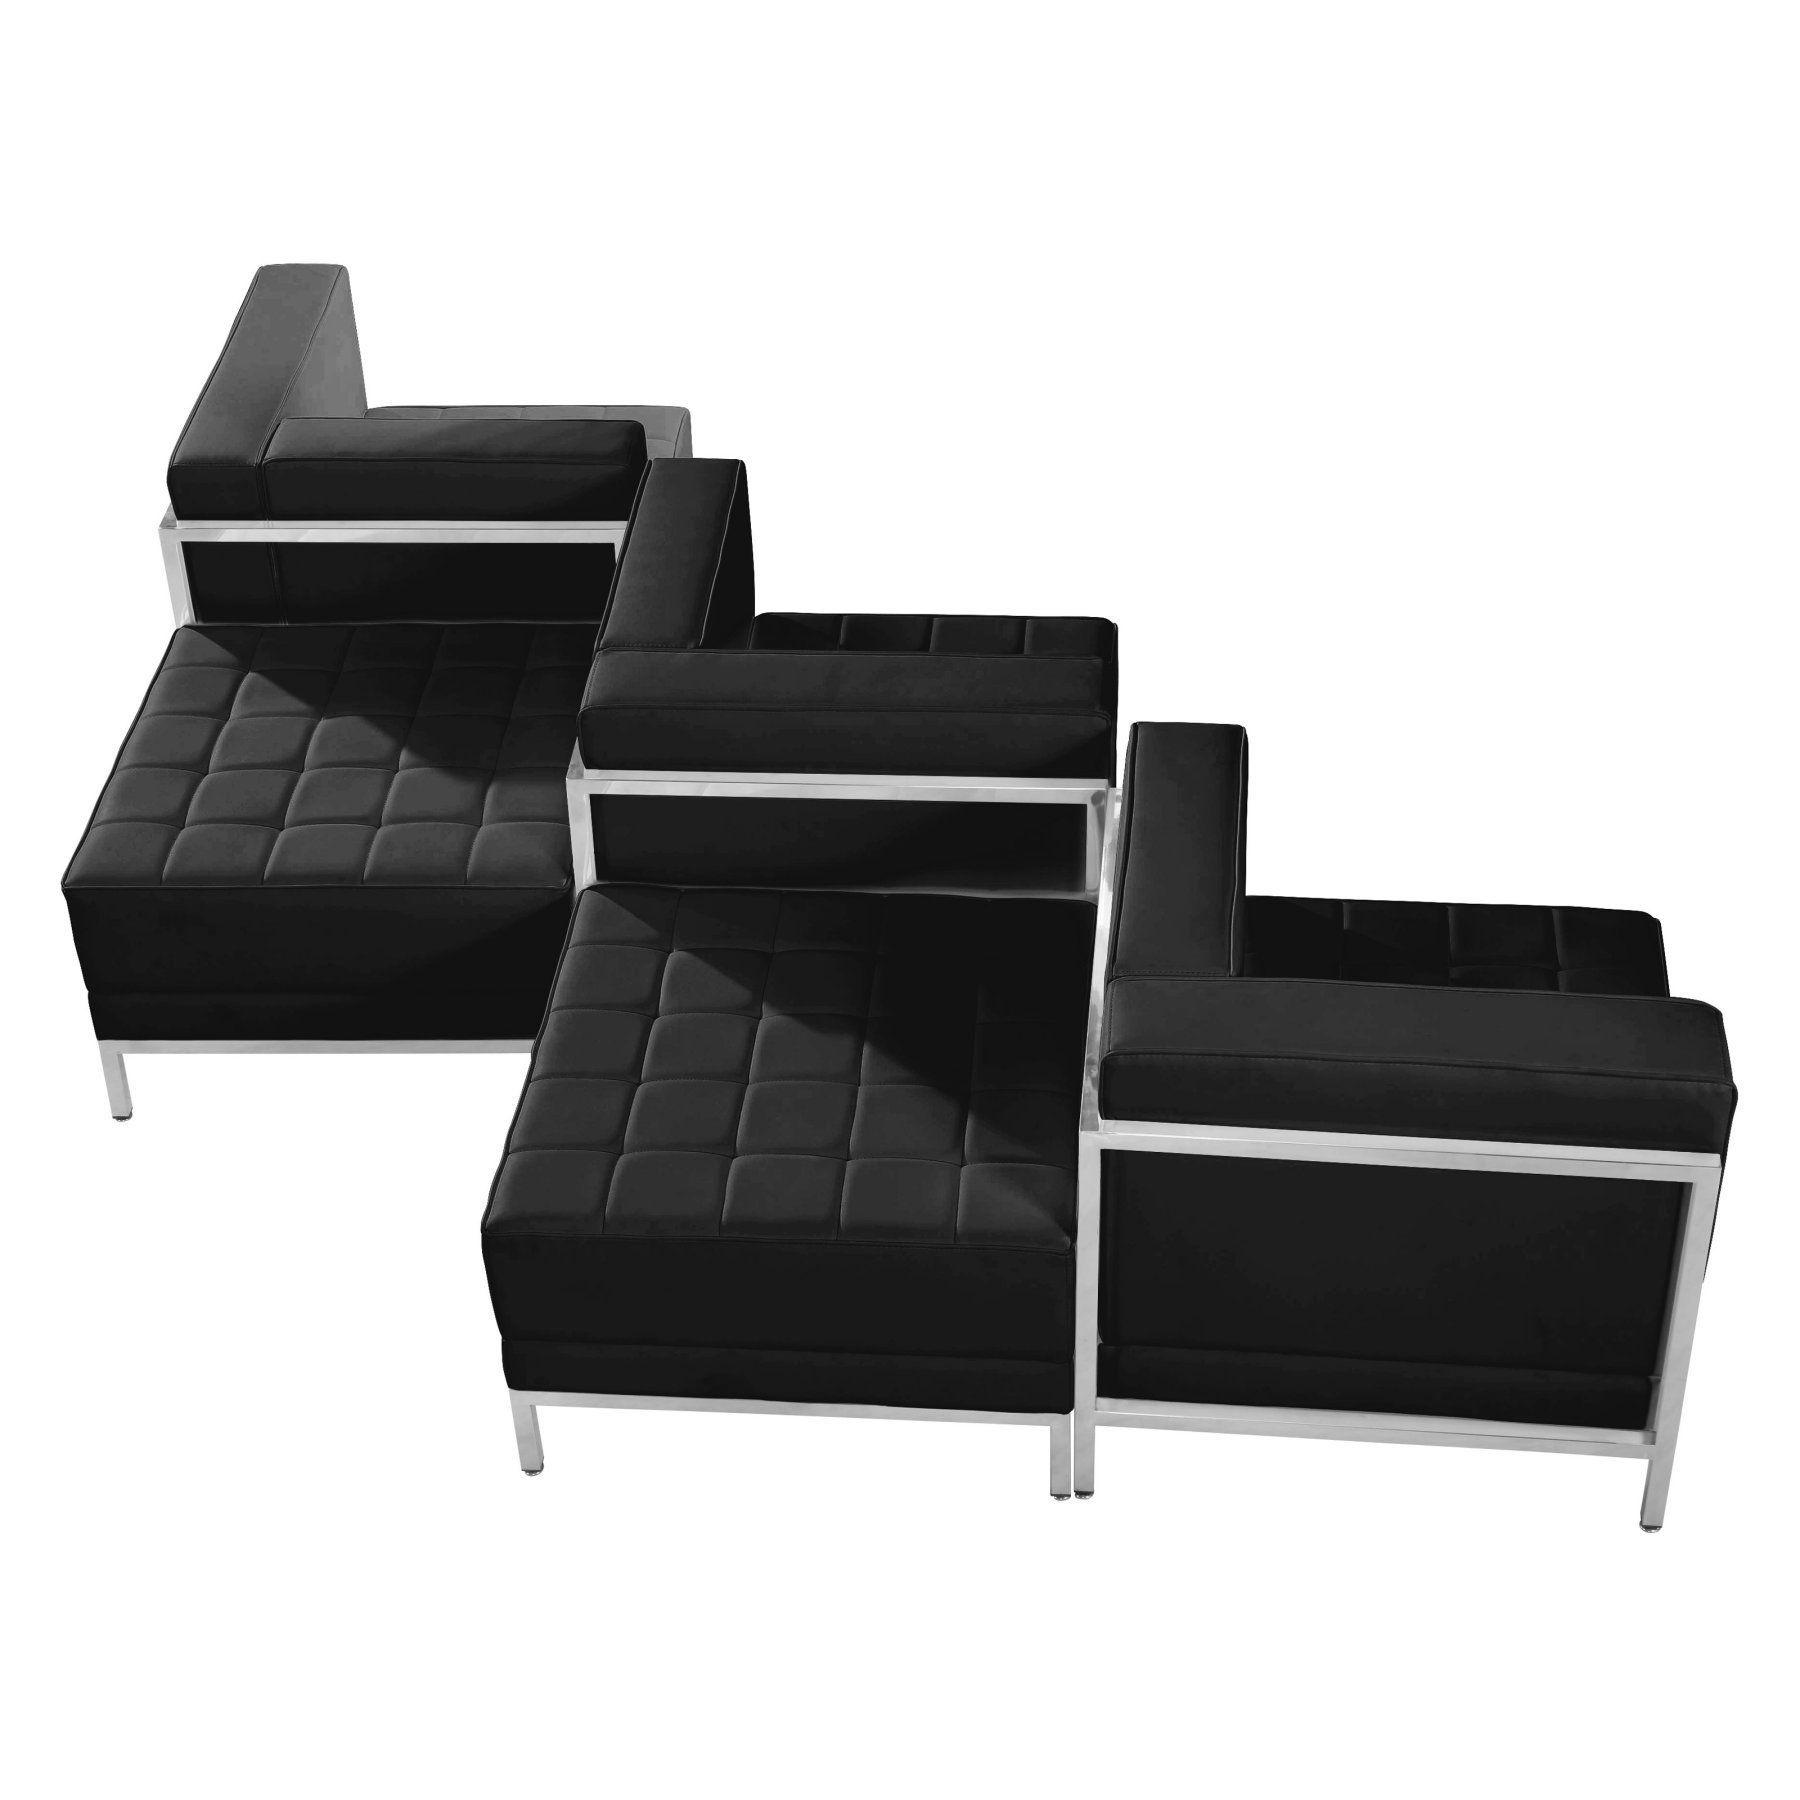 Flash Furniture Hercules Imagination Series 5 Piece Reception Chair ...